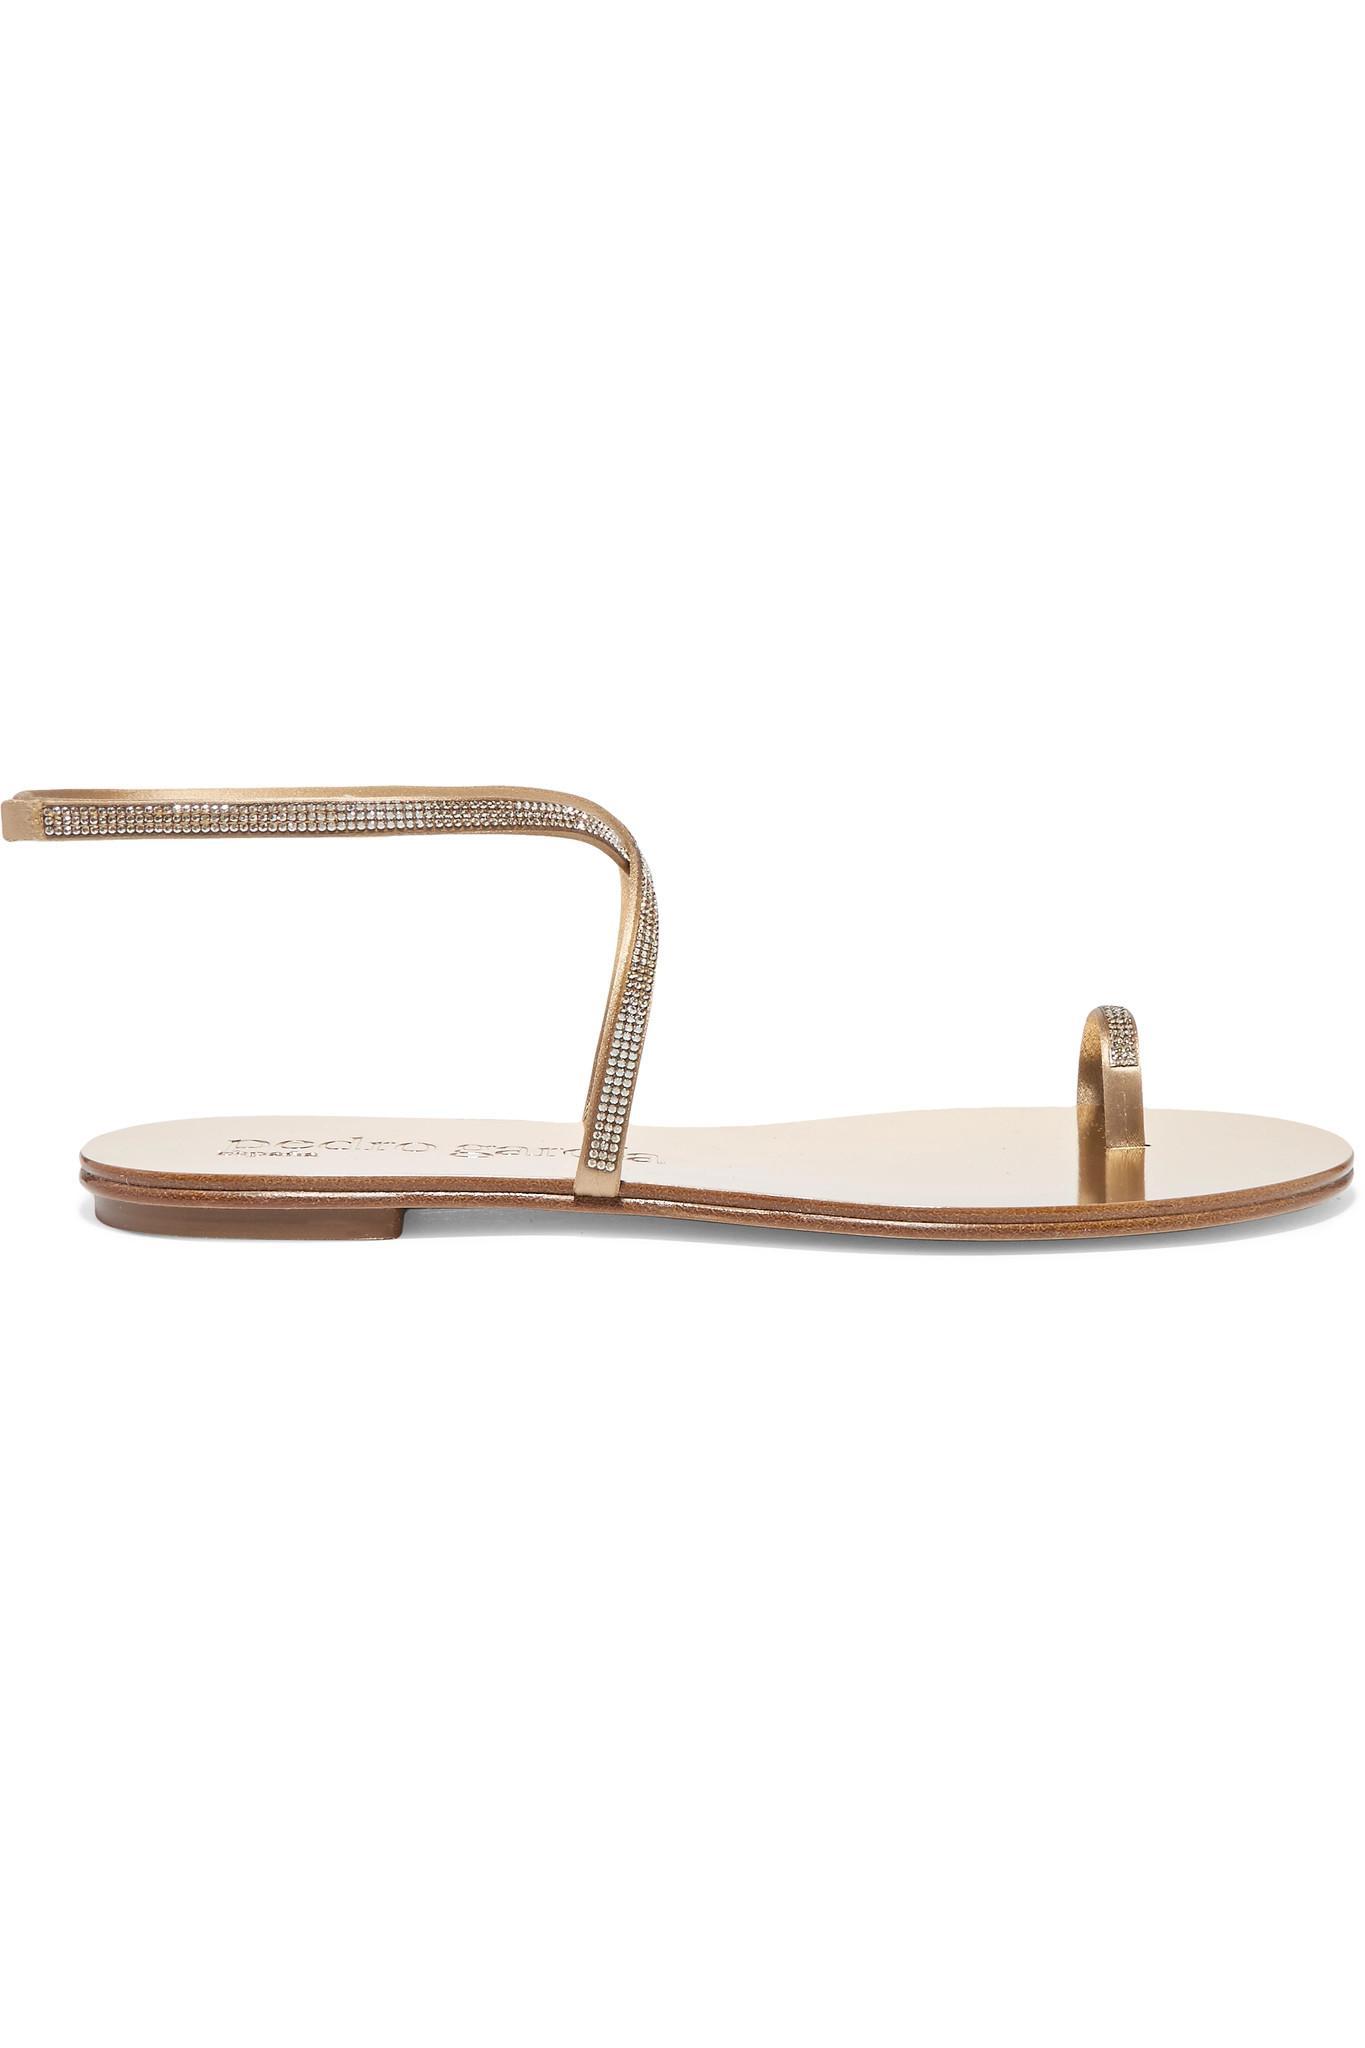 280963c34cc7f Pedro Garcia. Women s Metallic Sonay Swarovski Crystal-embellished Satin  Sandals